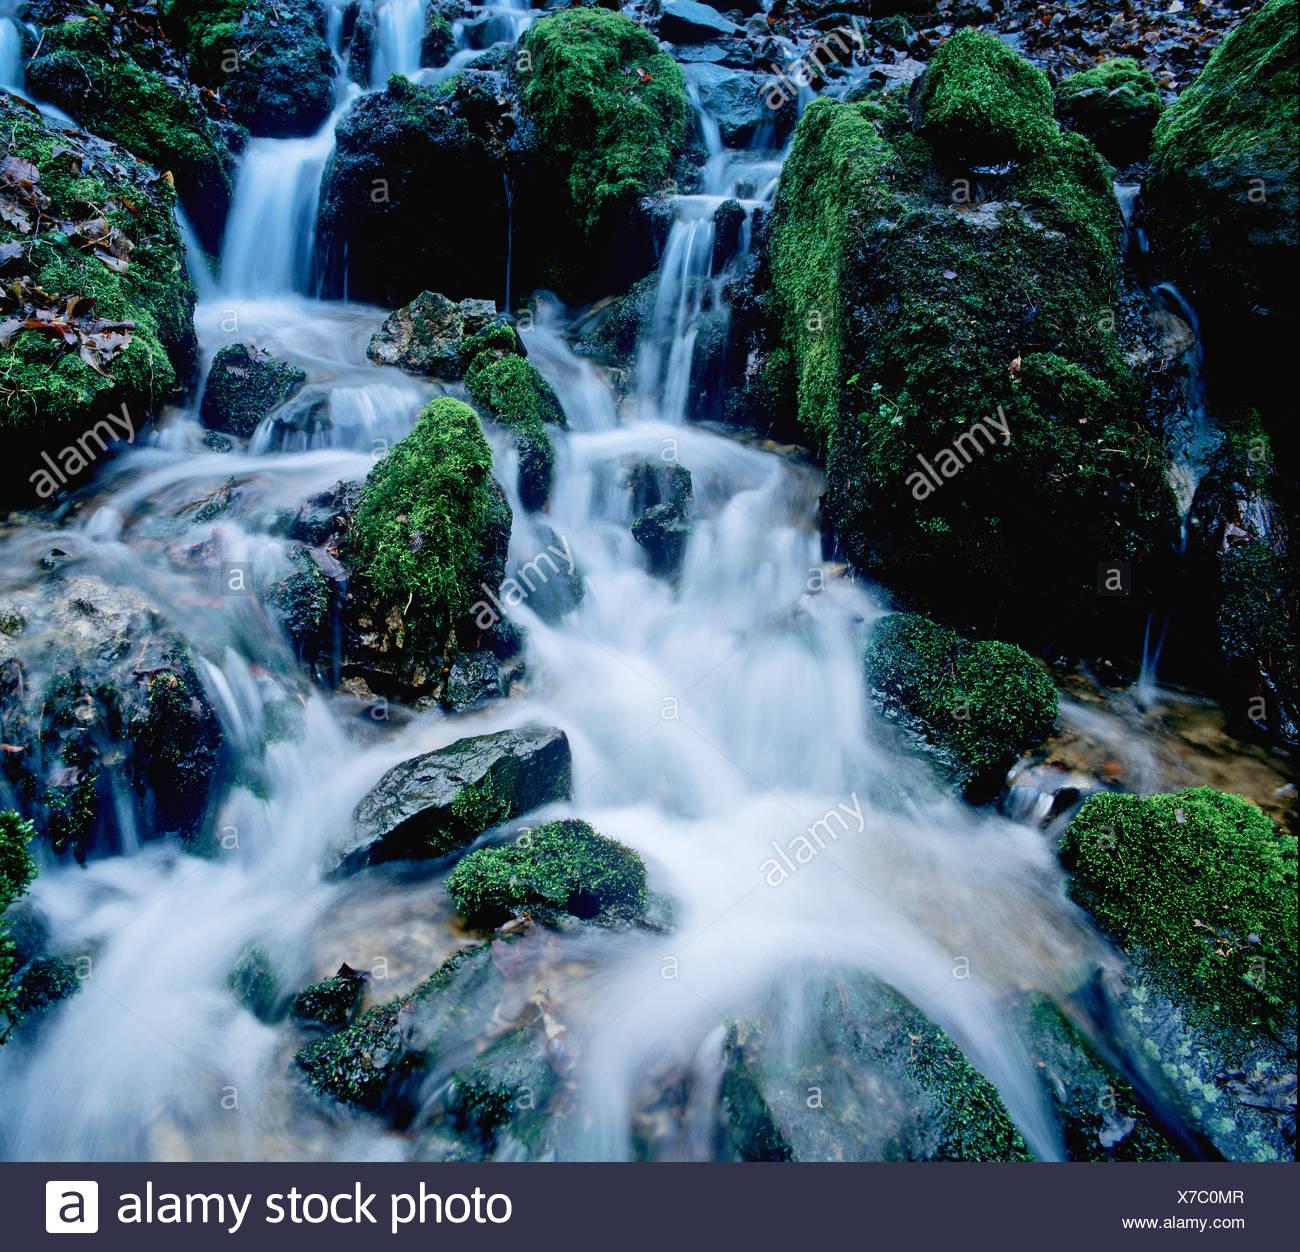 Roaring forest stream with mossy rocks, water, melt water, Glasbach creek, North Rhine-Westphalia, Germany, Europe Stock Photo